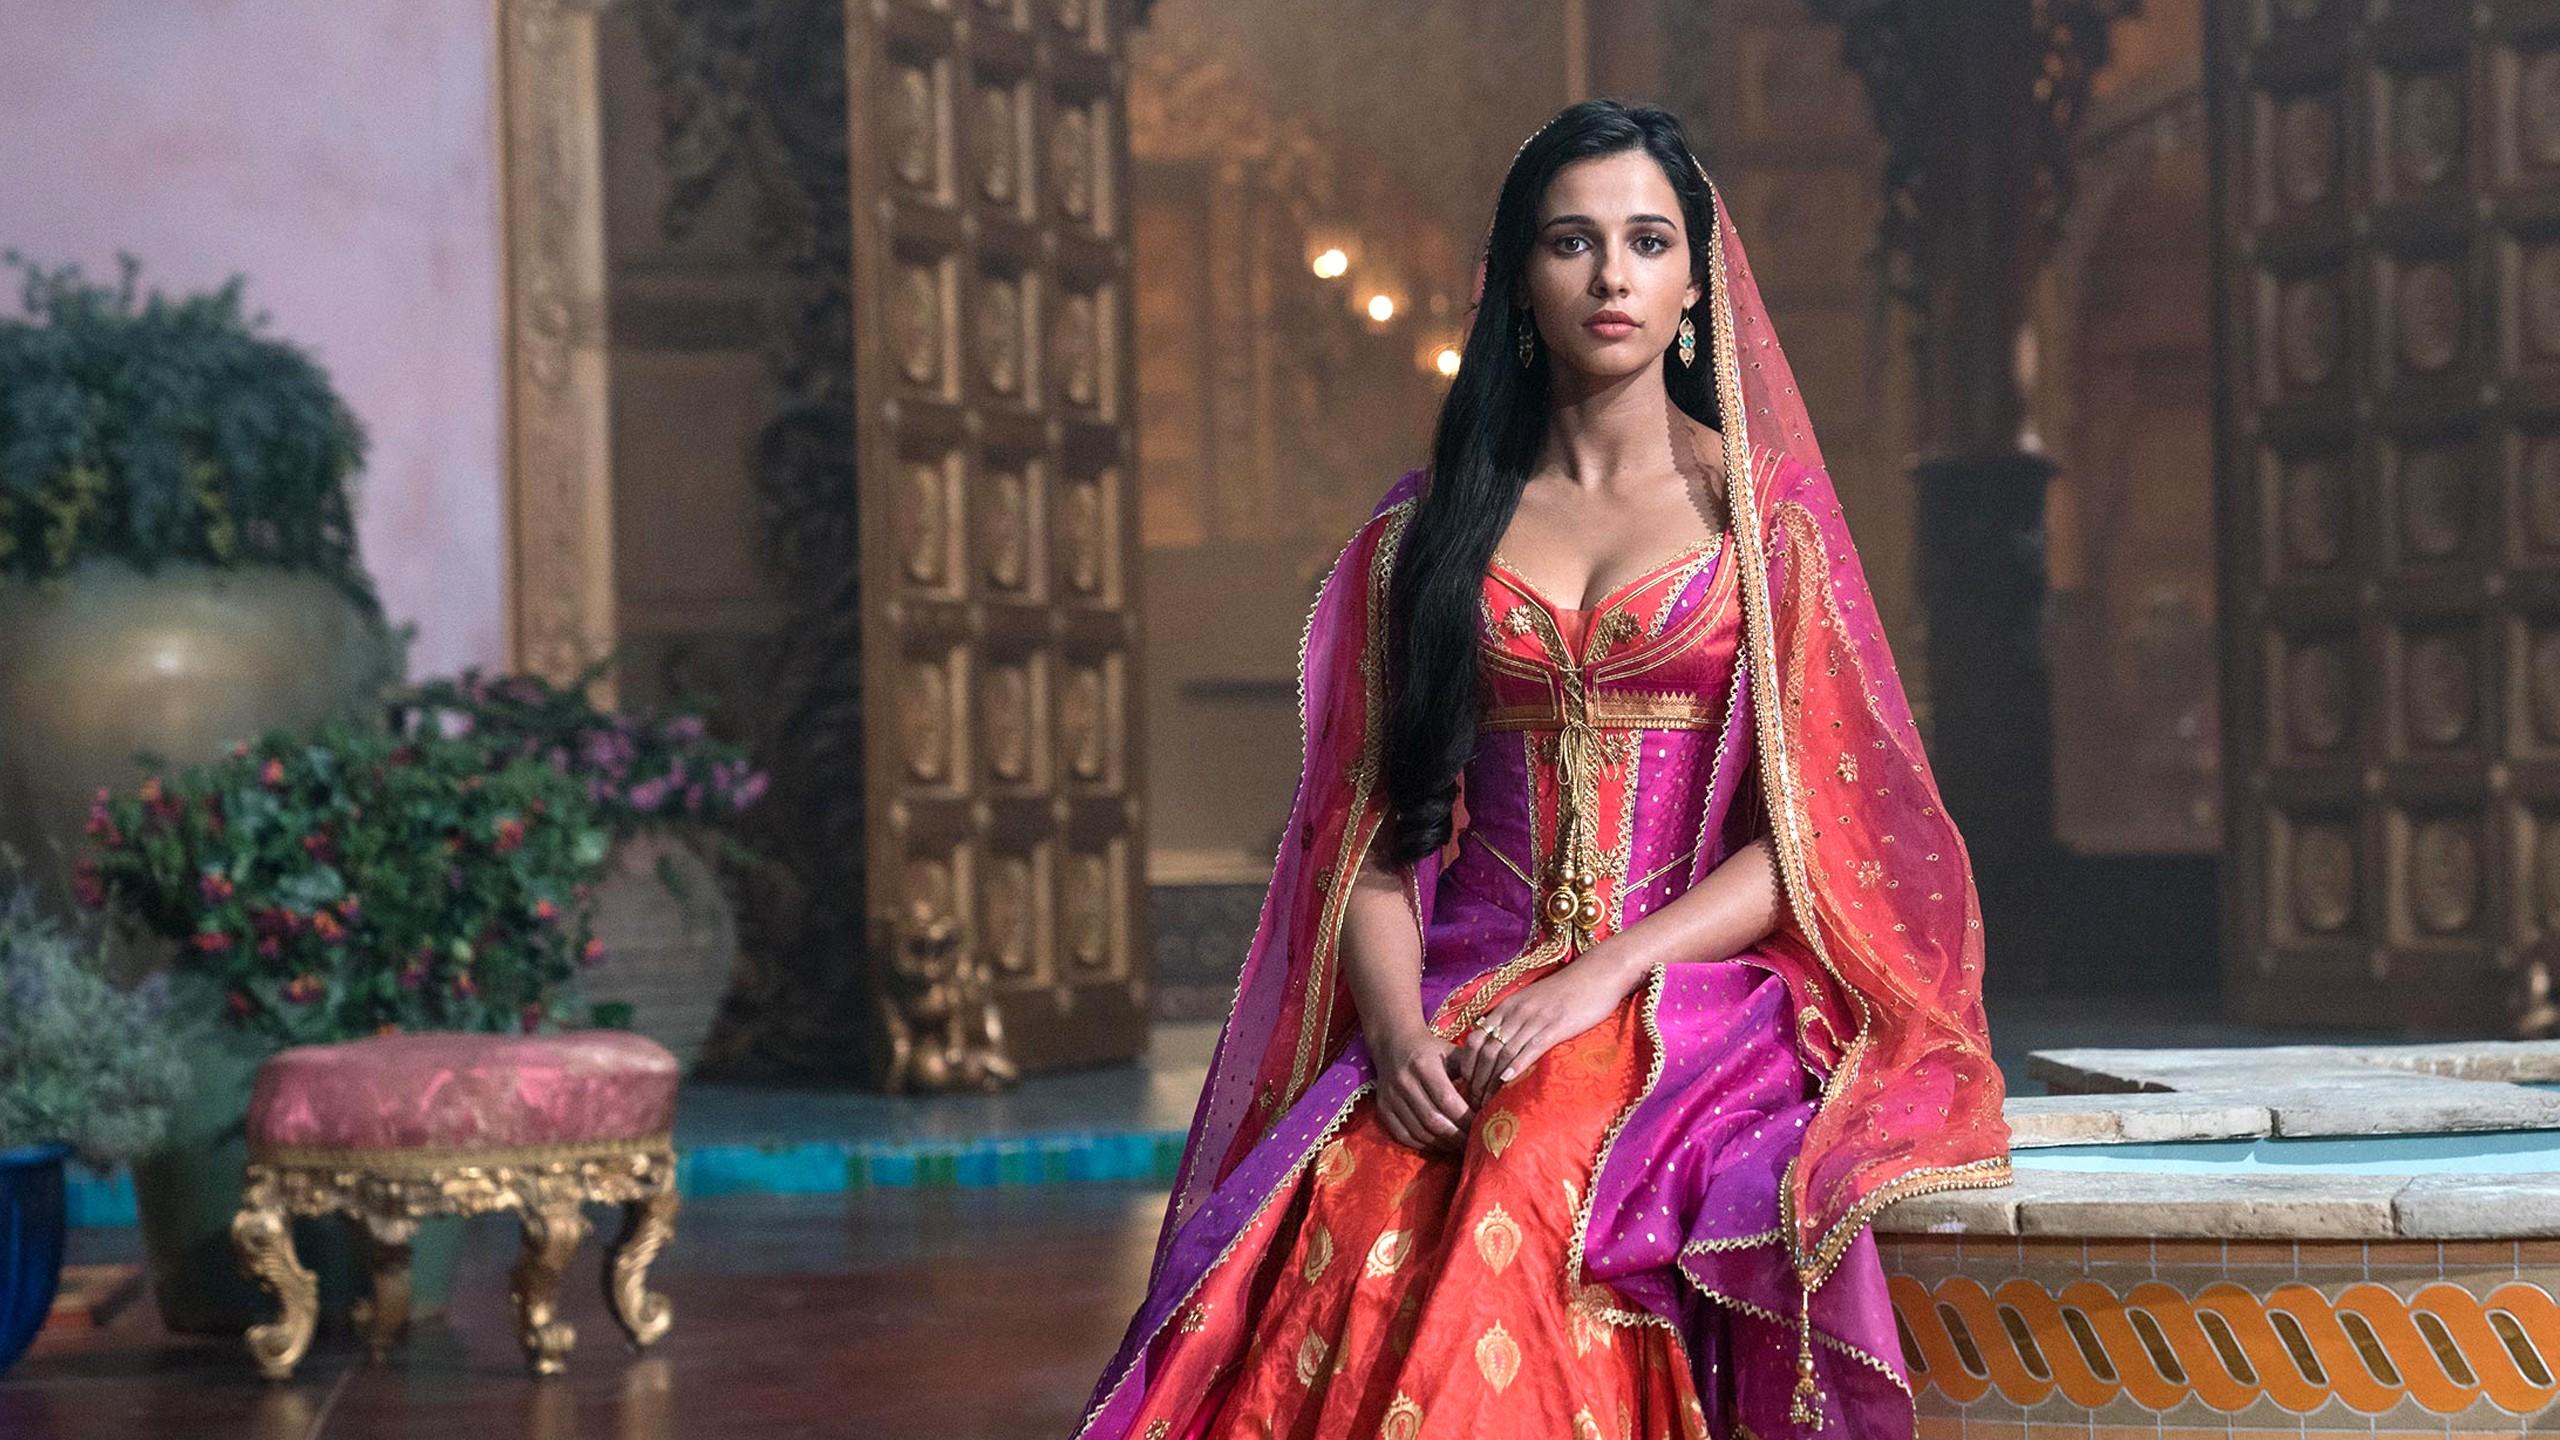 Naomi Scott As Princess Jasmine In Aladdin Wallpapers HD